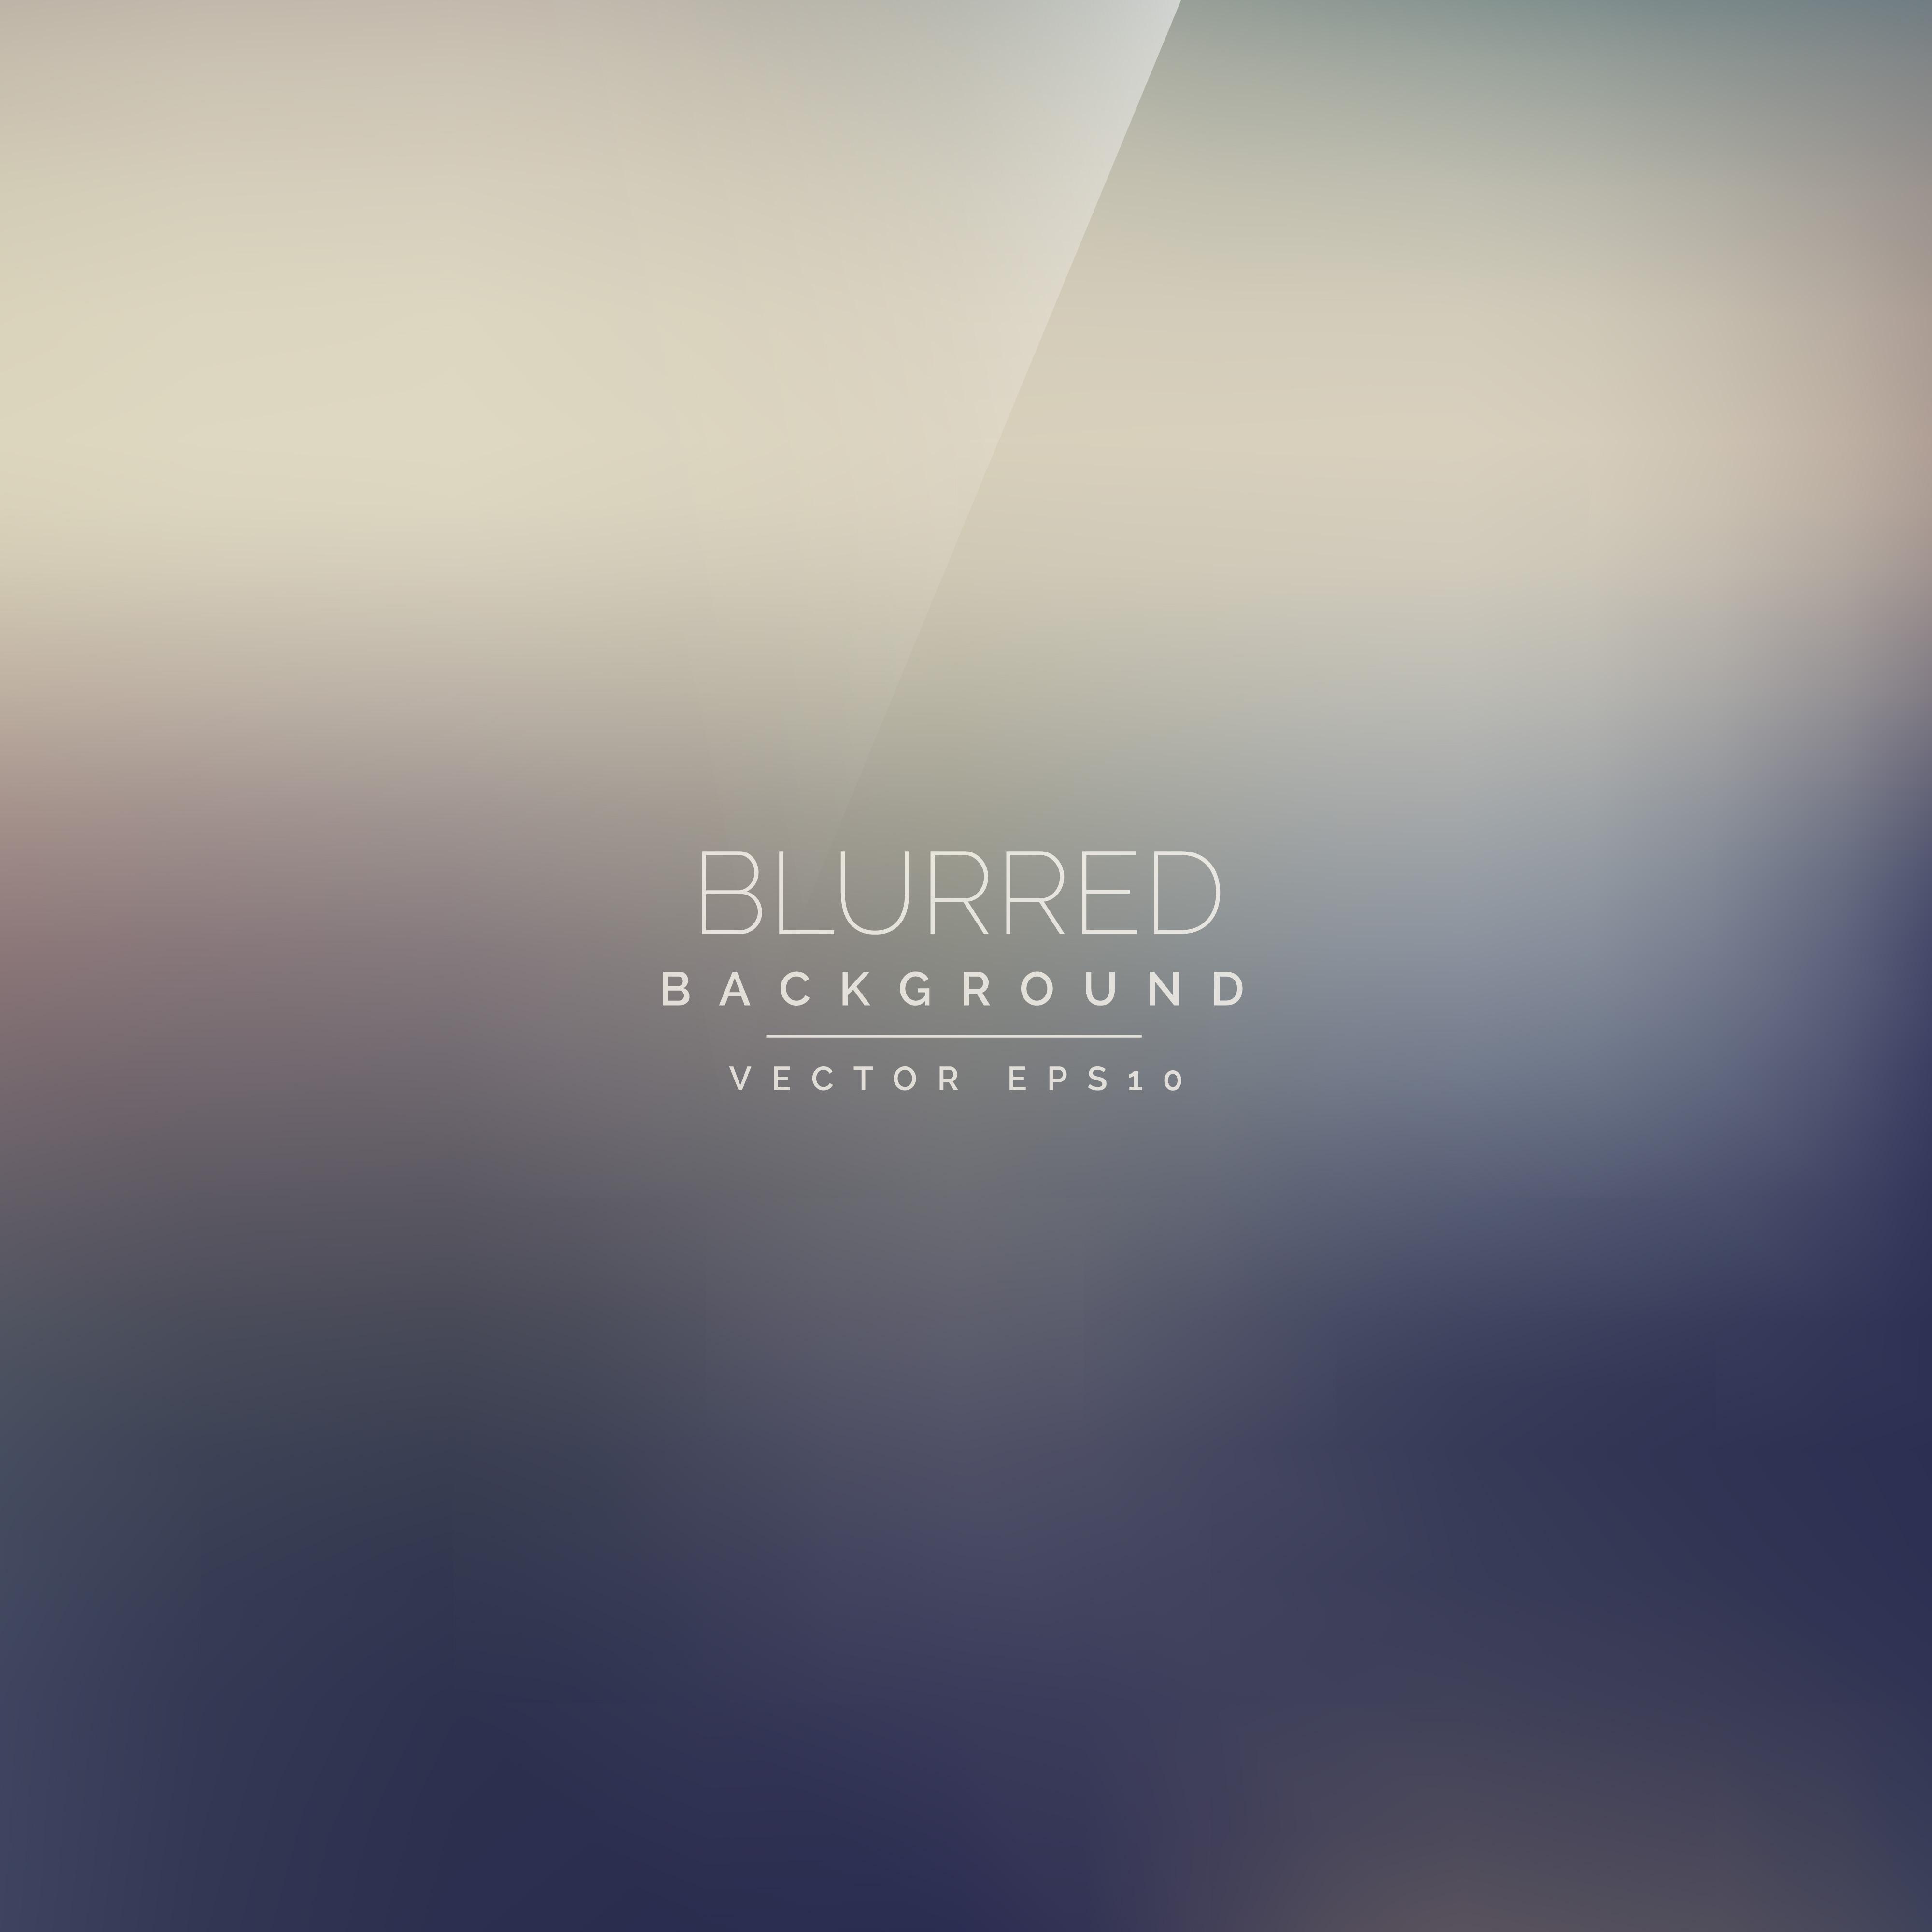 blurred wallpaper free vector art